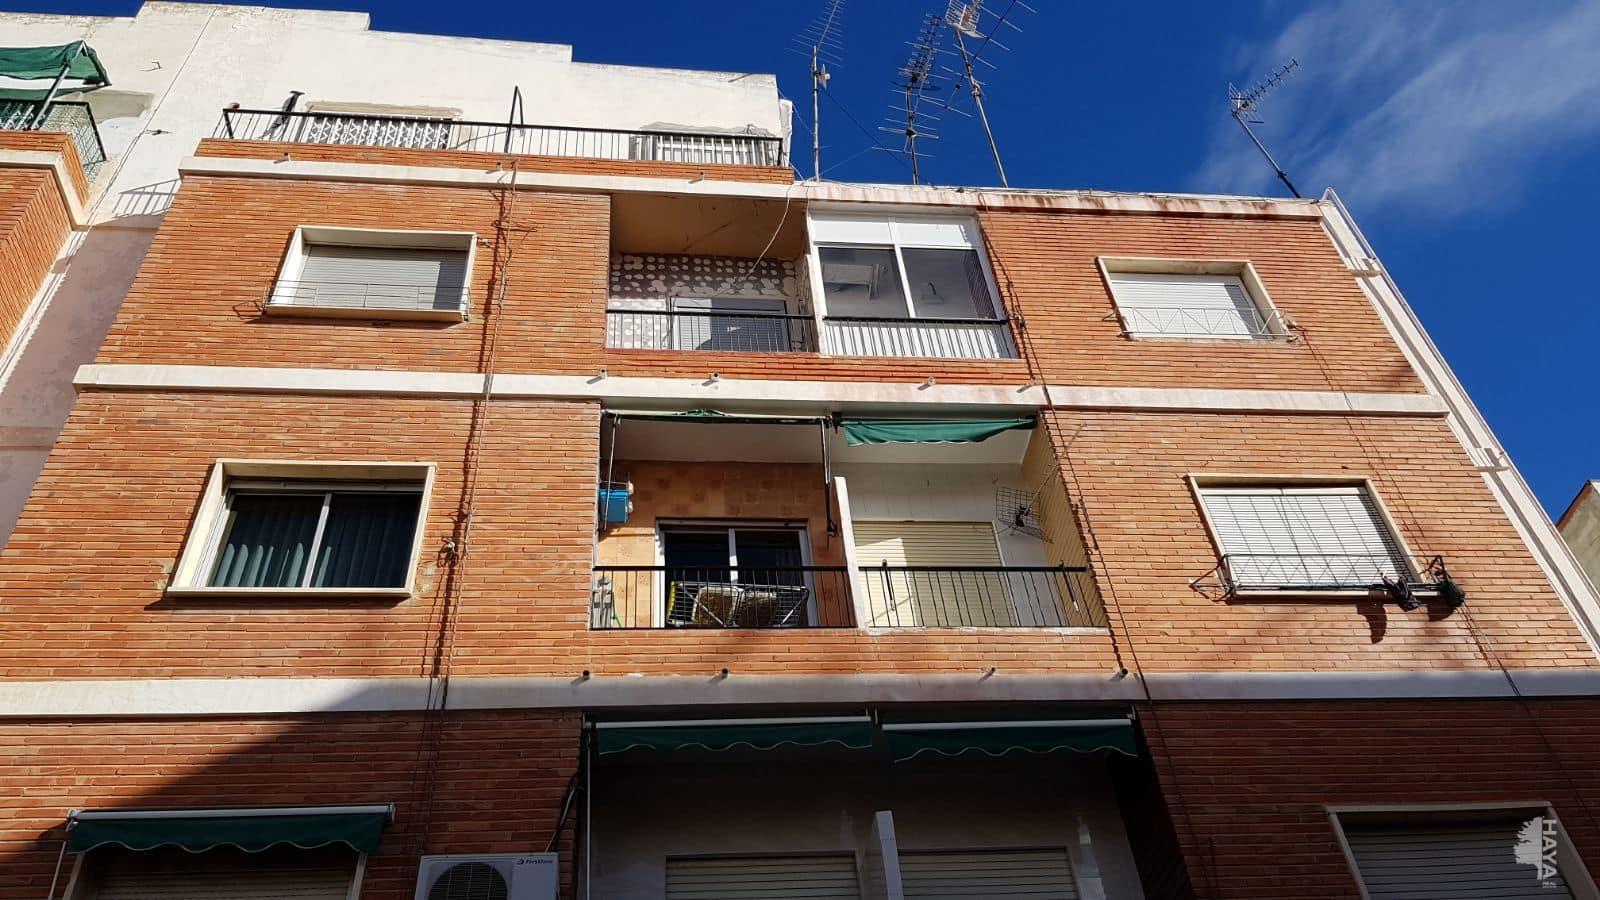 Piso en venta en Burjassot, Valencia, Calle Mendizabal, 57.704 €, 3 habitaciones, 1 baño, 102 m2